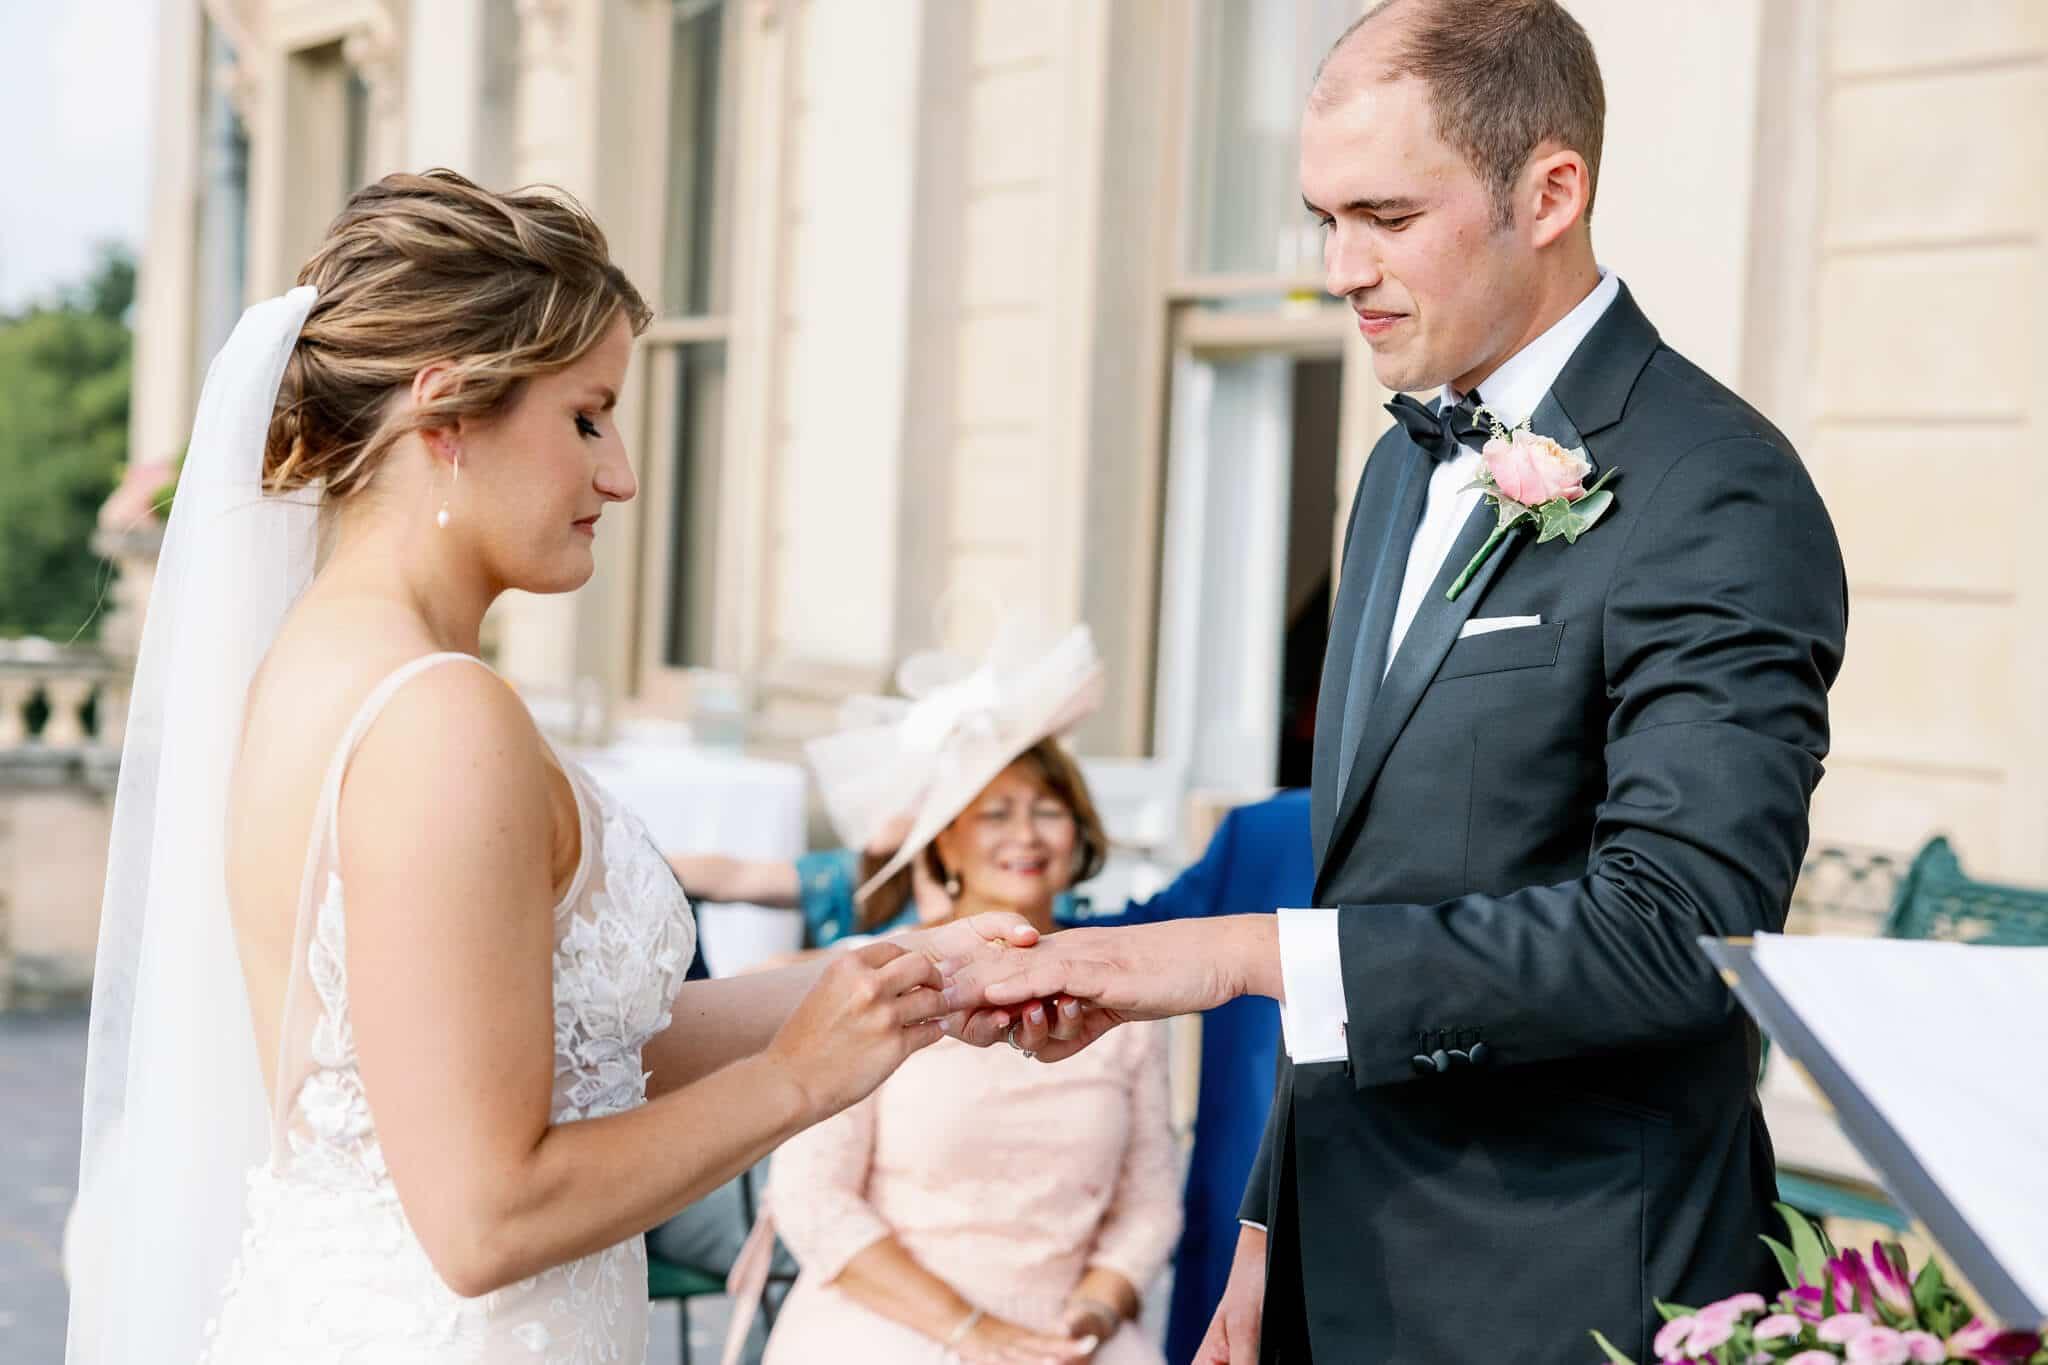 Ring exchange outdoor ceremony | Wedding venues west london